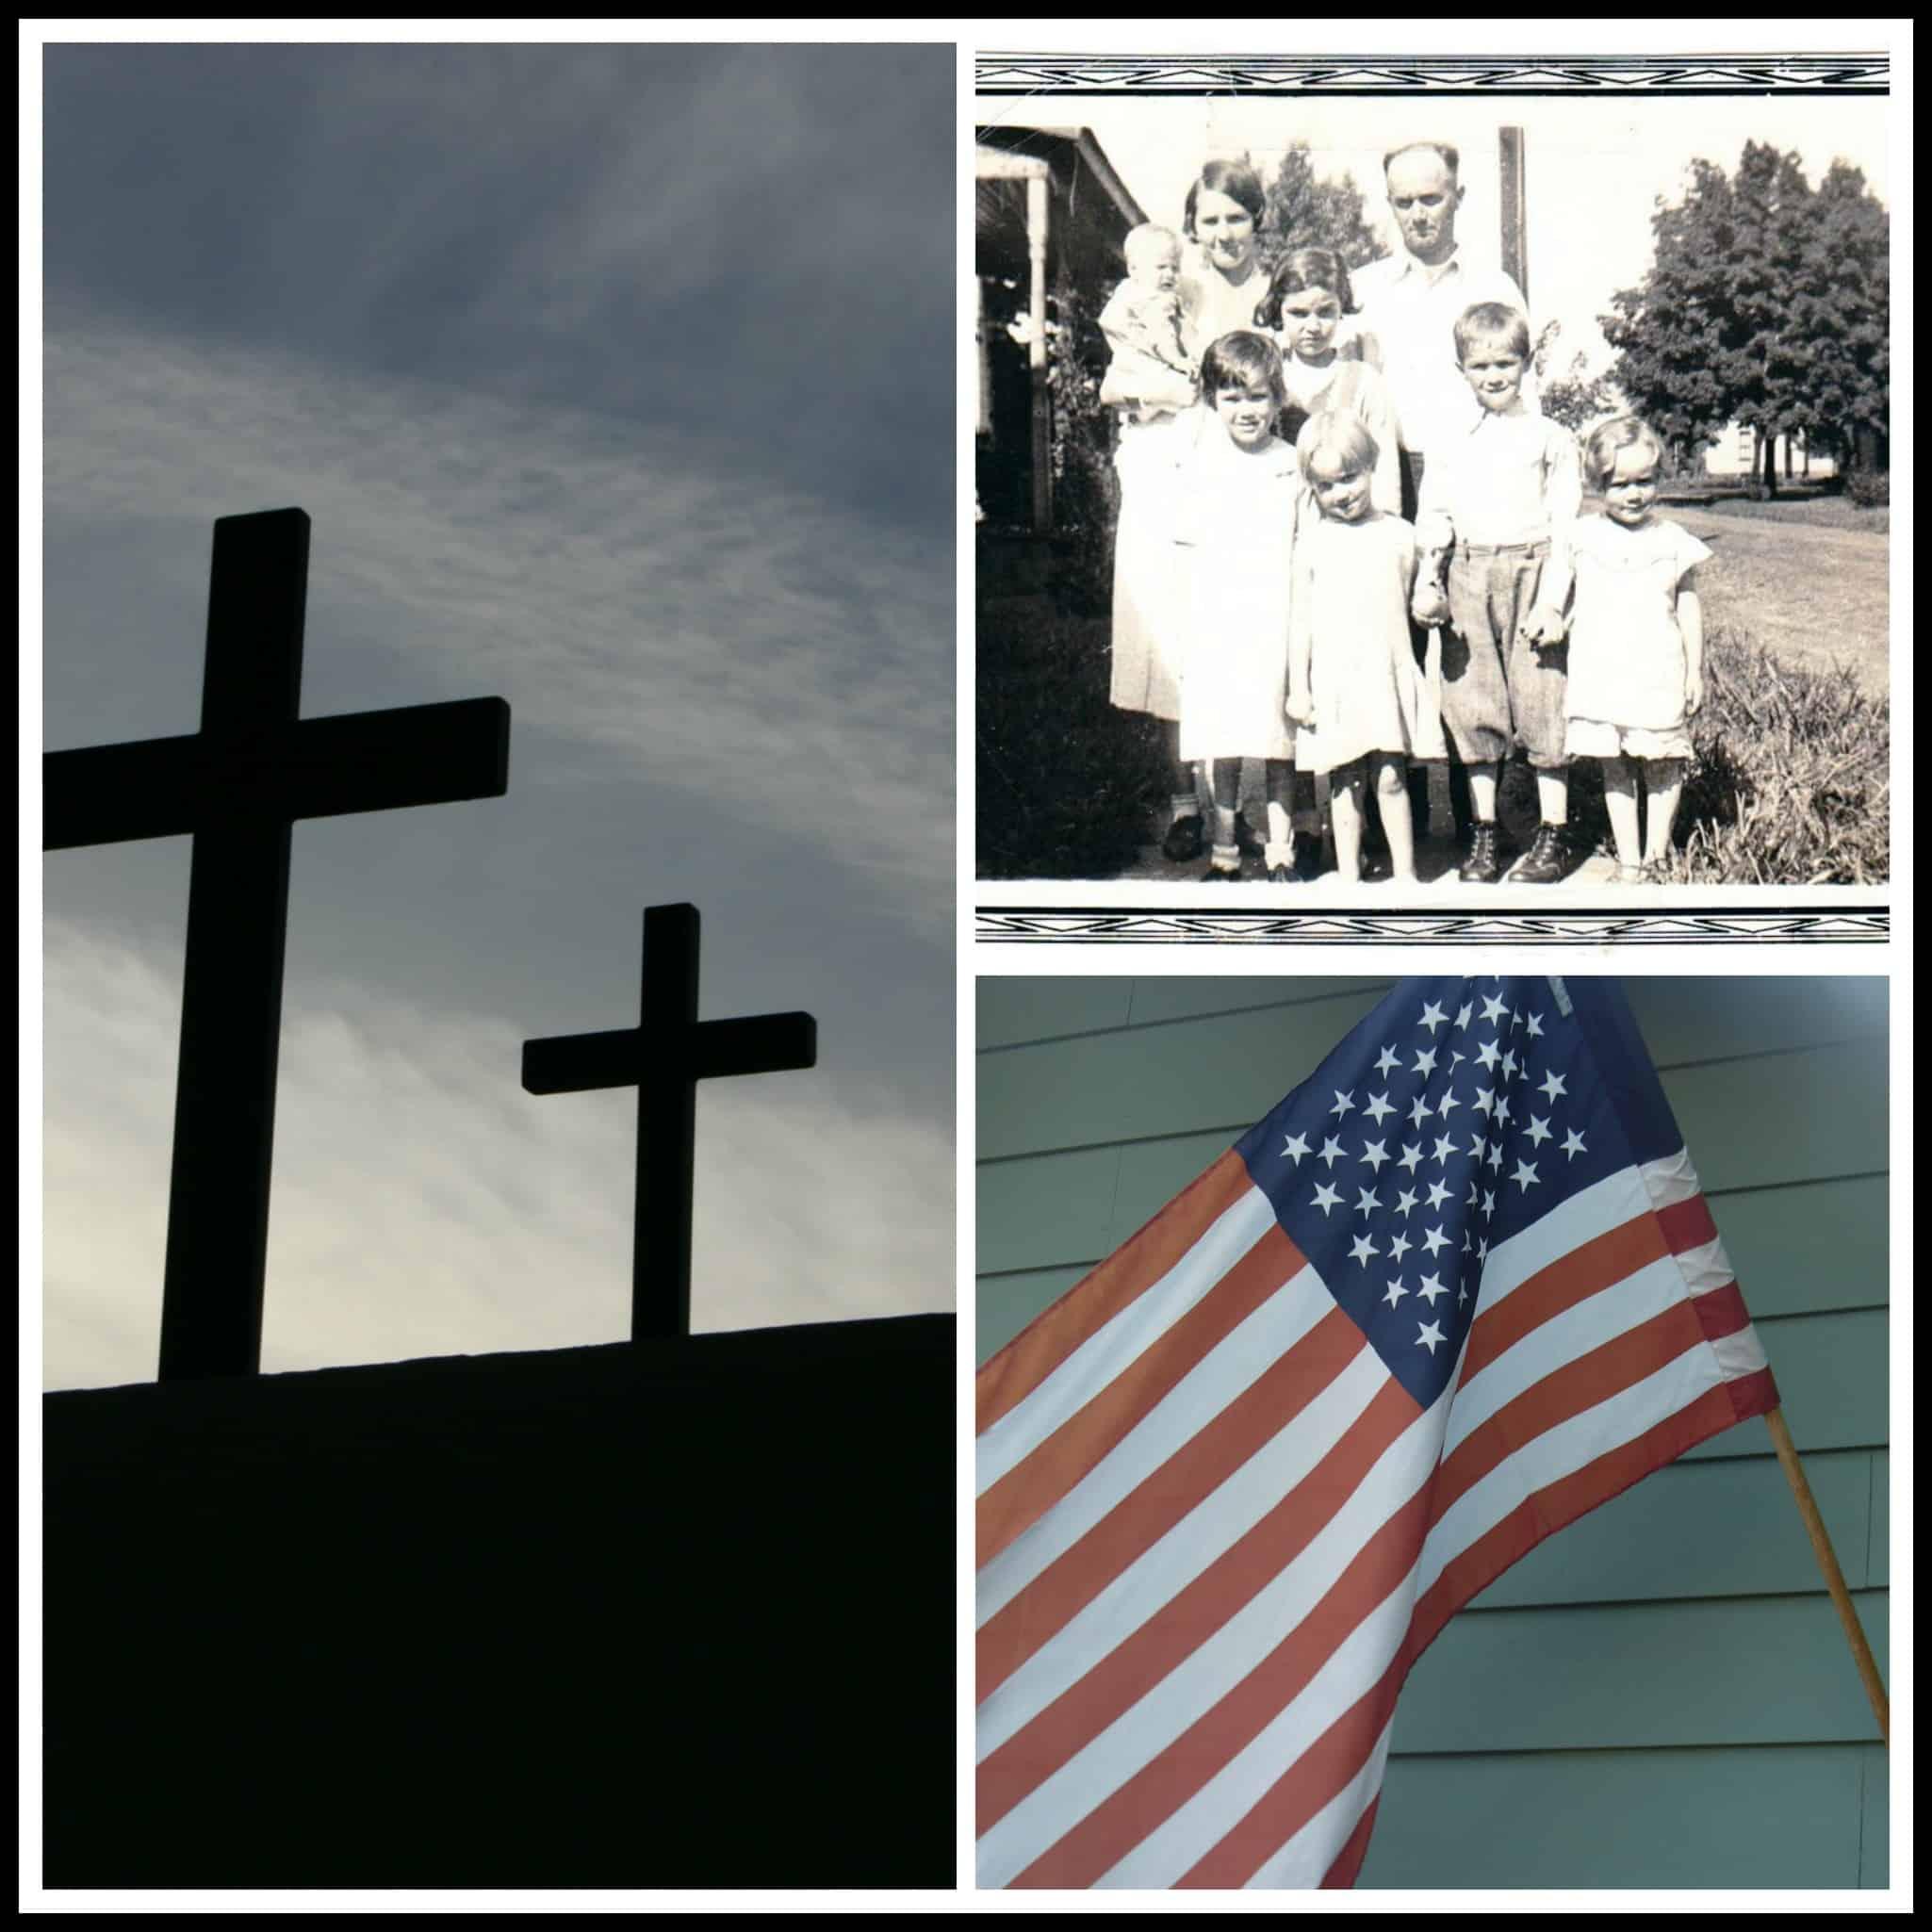 The 3 F's-Faith, Family, and Freedom